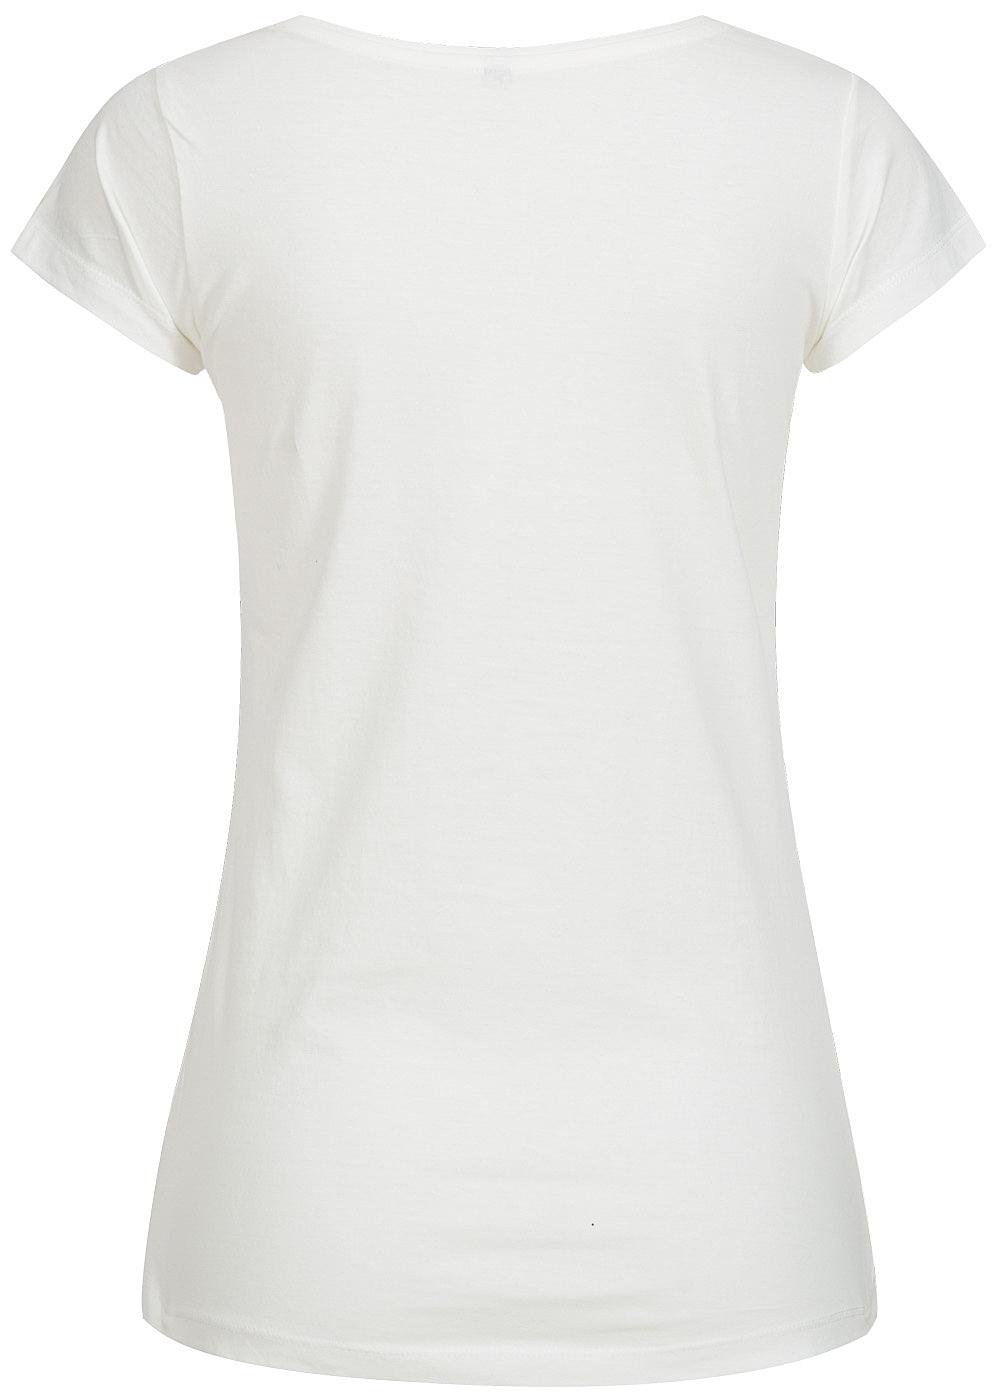 Eight2nine damen t shirt kurzarm wassermelone print by for T shirt printing one off